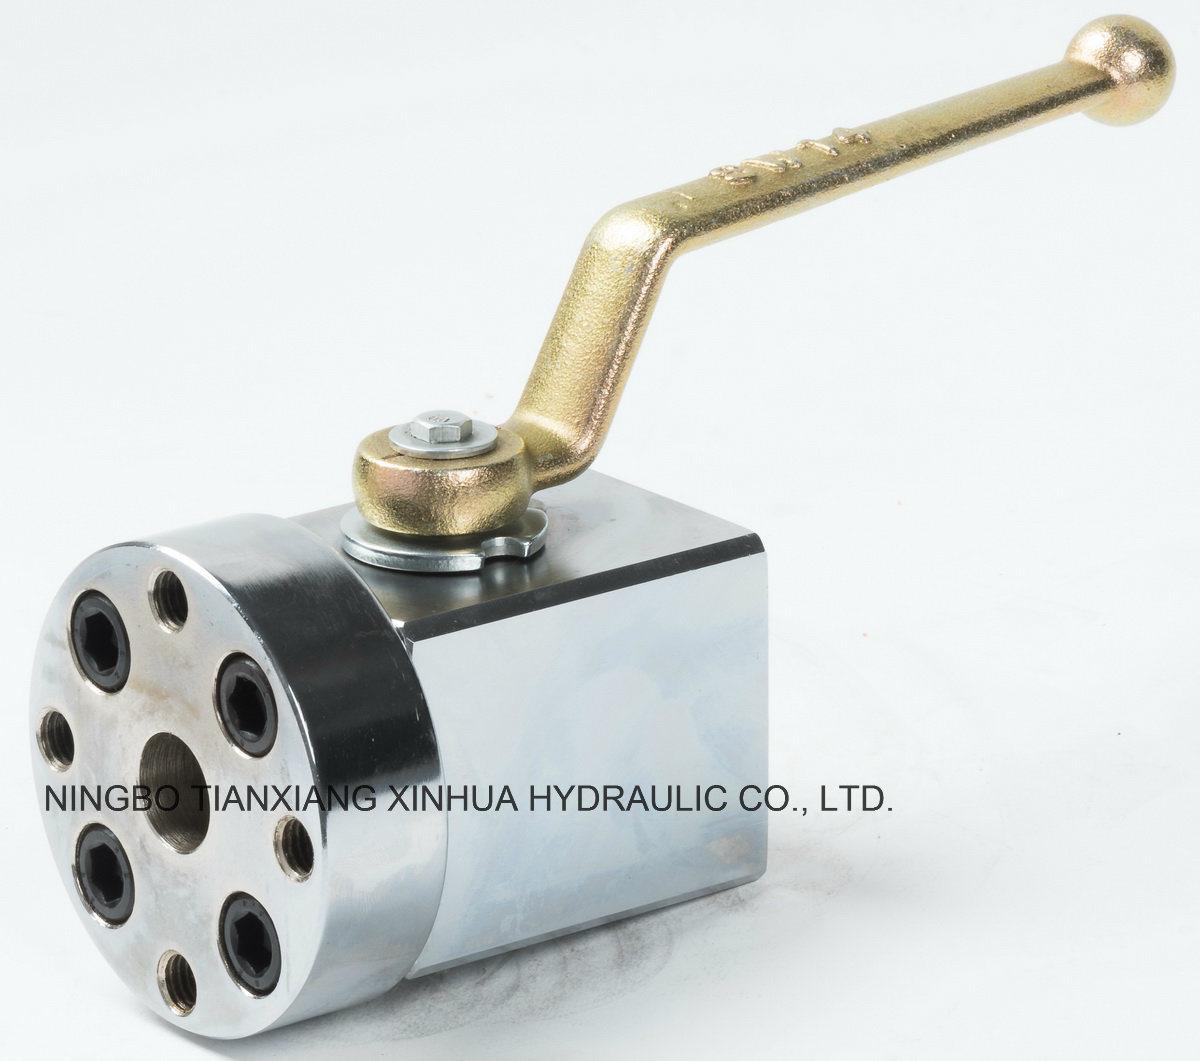 Carbon Steel Cjzq Ball Type Shutoff Valve